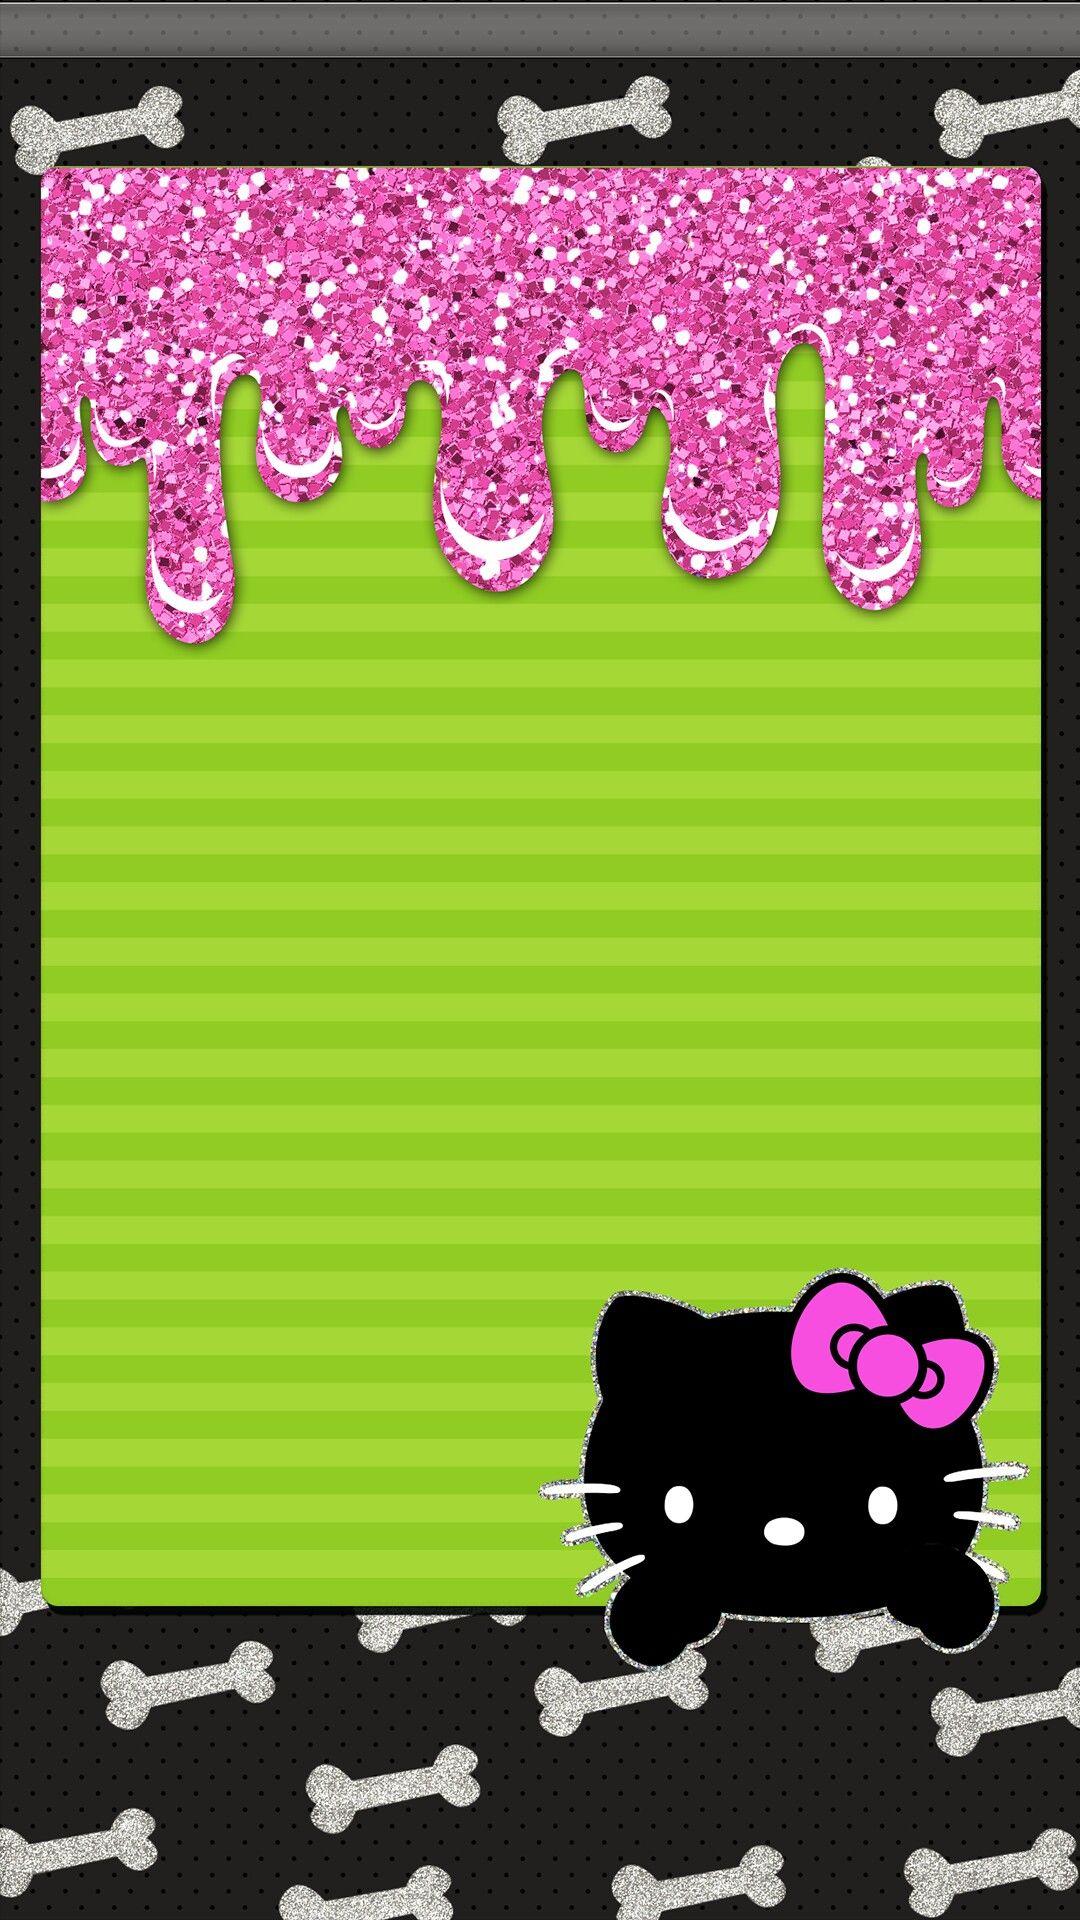 Beautiful Wallpaper Halloween Hello Kitty - a29b2851cb5ff6a523feb526915d2e56  Perfect Image Reference_503636.jpg